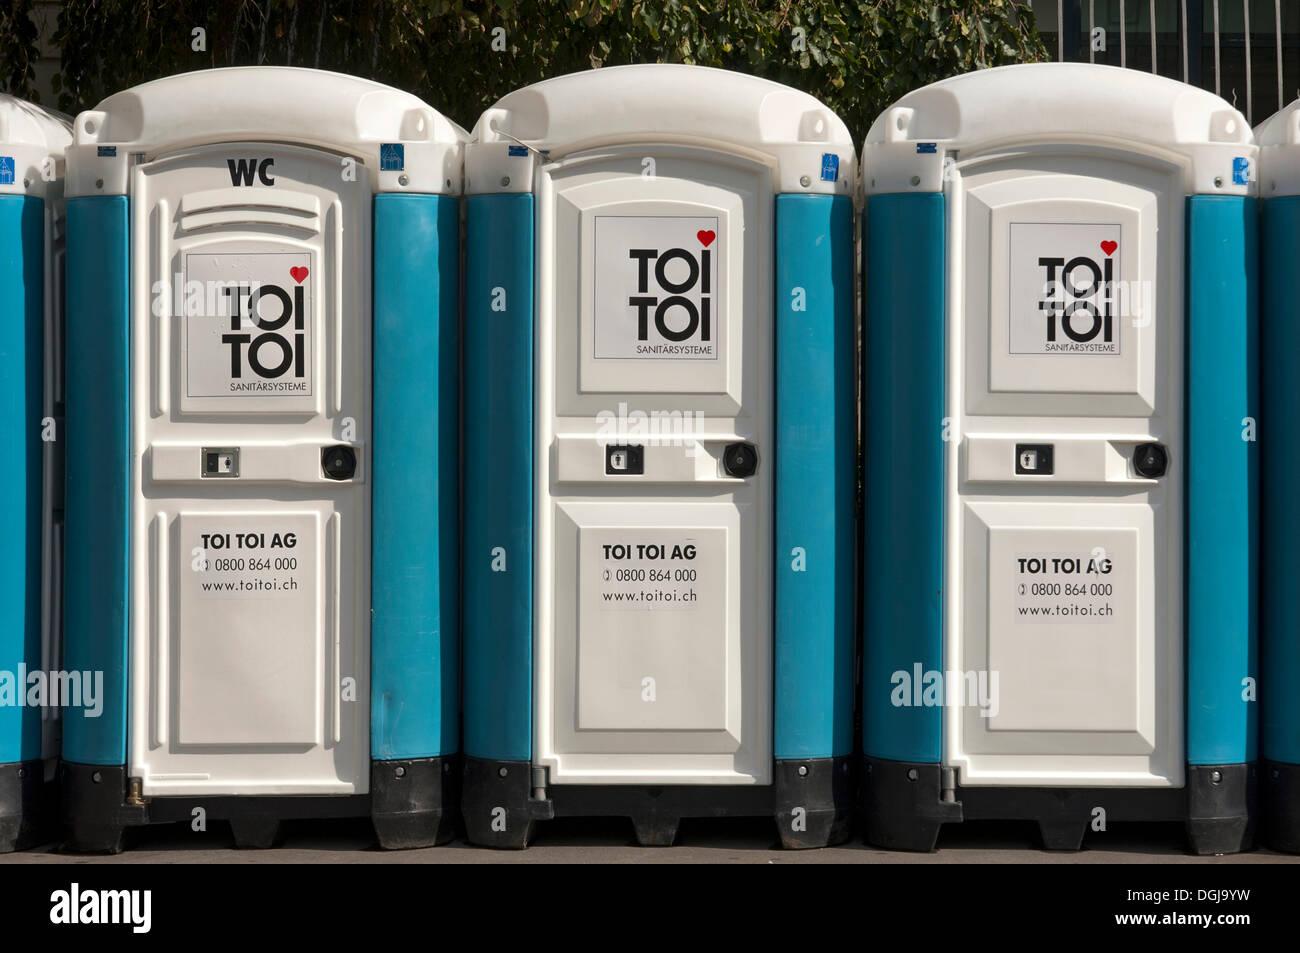 toi toi mobile toilets switzerland europe stock photo royalty free image 61868573 alamy. Black Bedroom Furniture Sets. Home Design Ideas